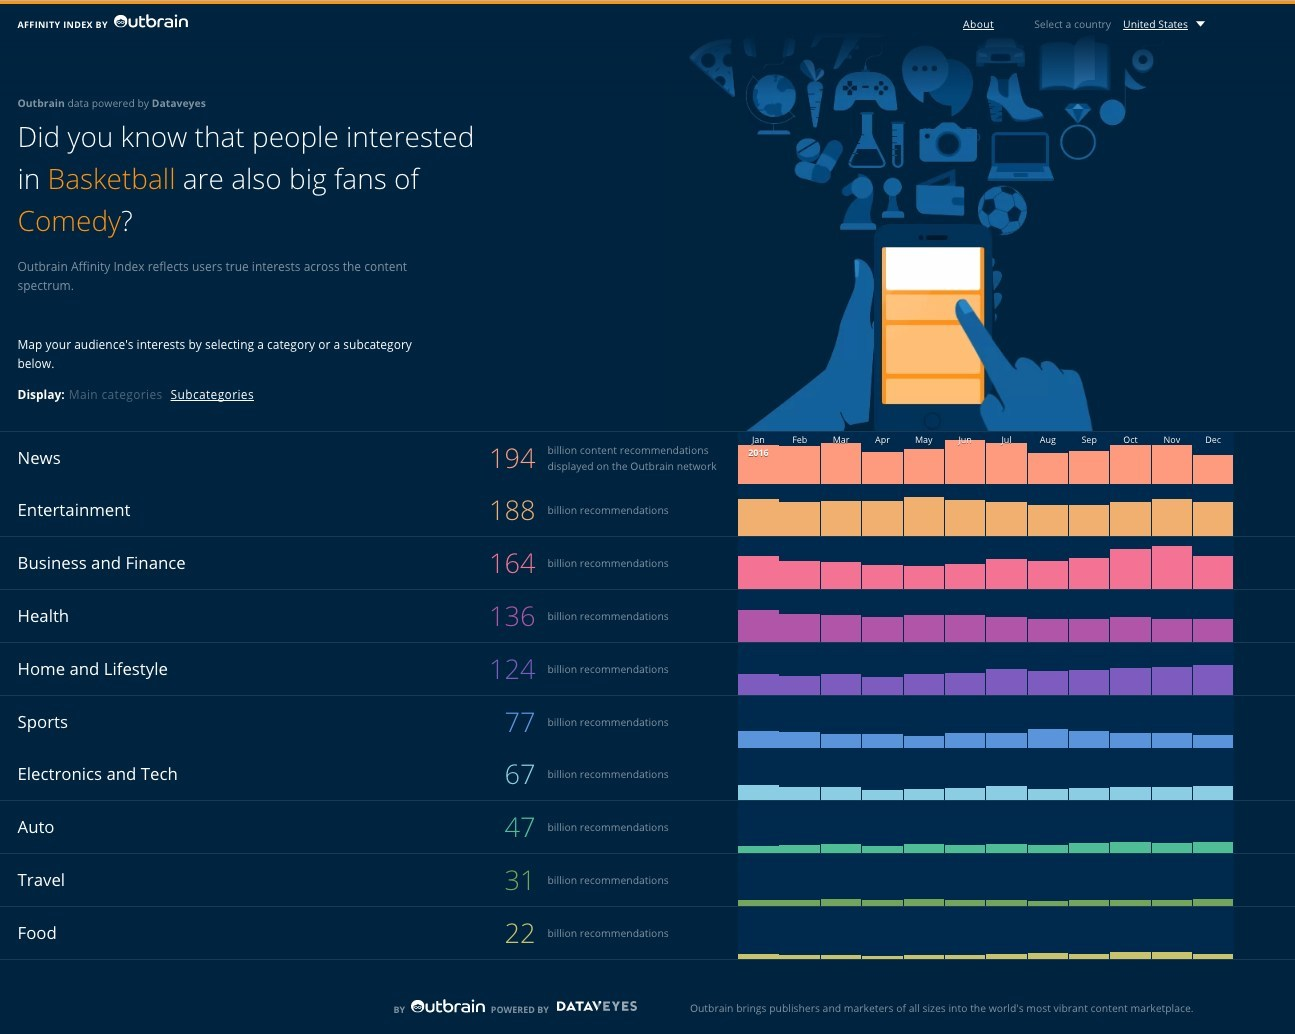 Outbrain & Dataveyes Reveal Affinity Index